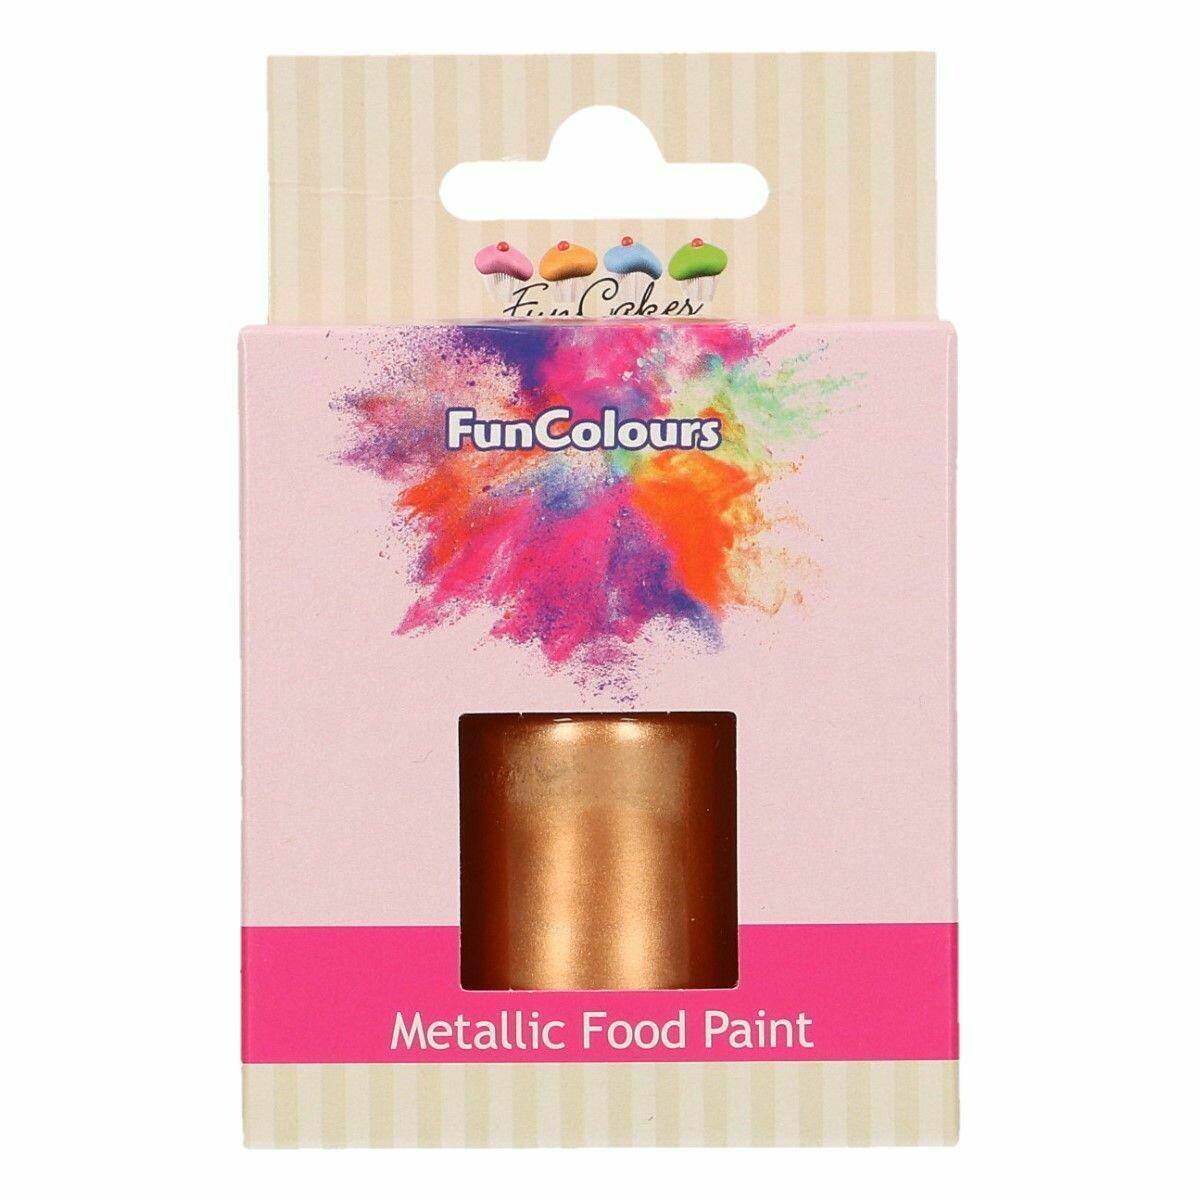 FunCakes Edible Metallic Food Paints -COPPER -Μεταλλικό Βρώσιμο Χρώμα Ζωγραφικής -Χαλκός 30ml